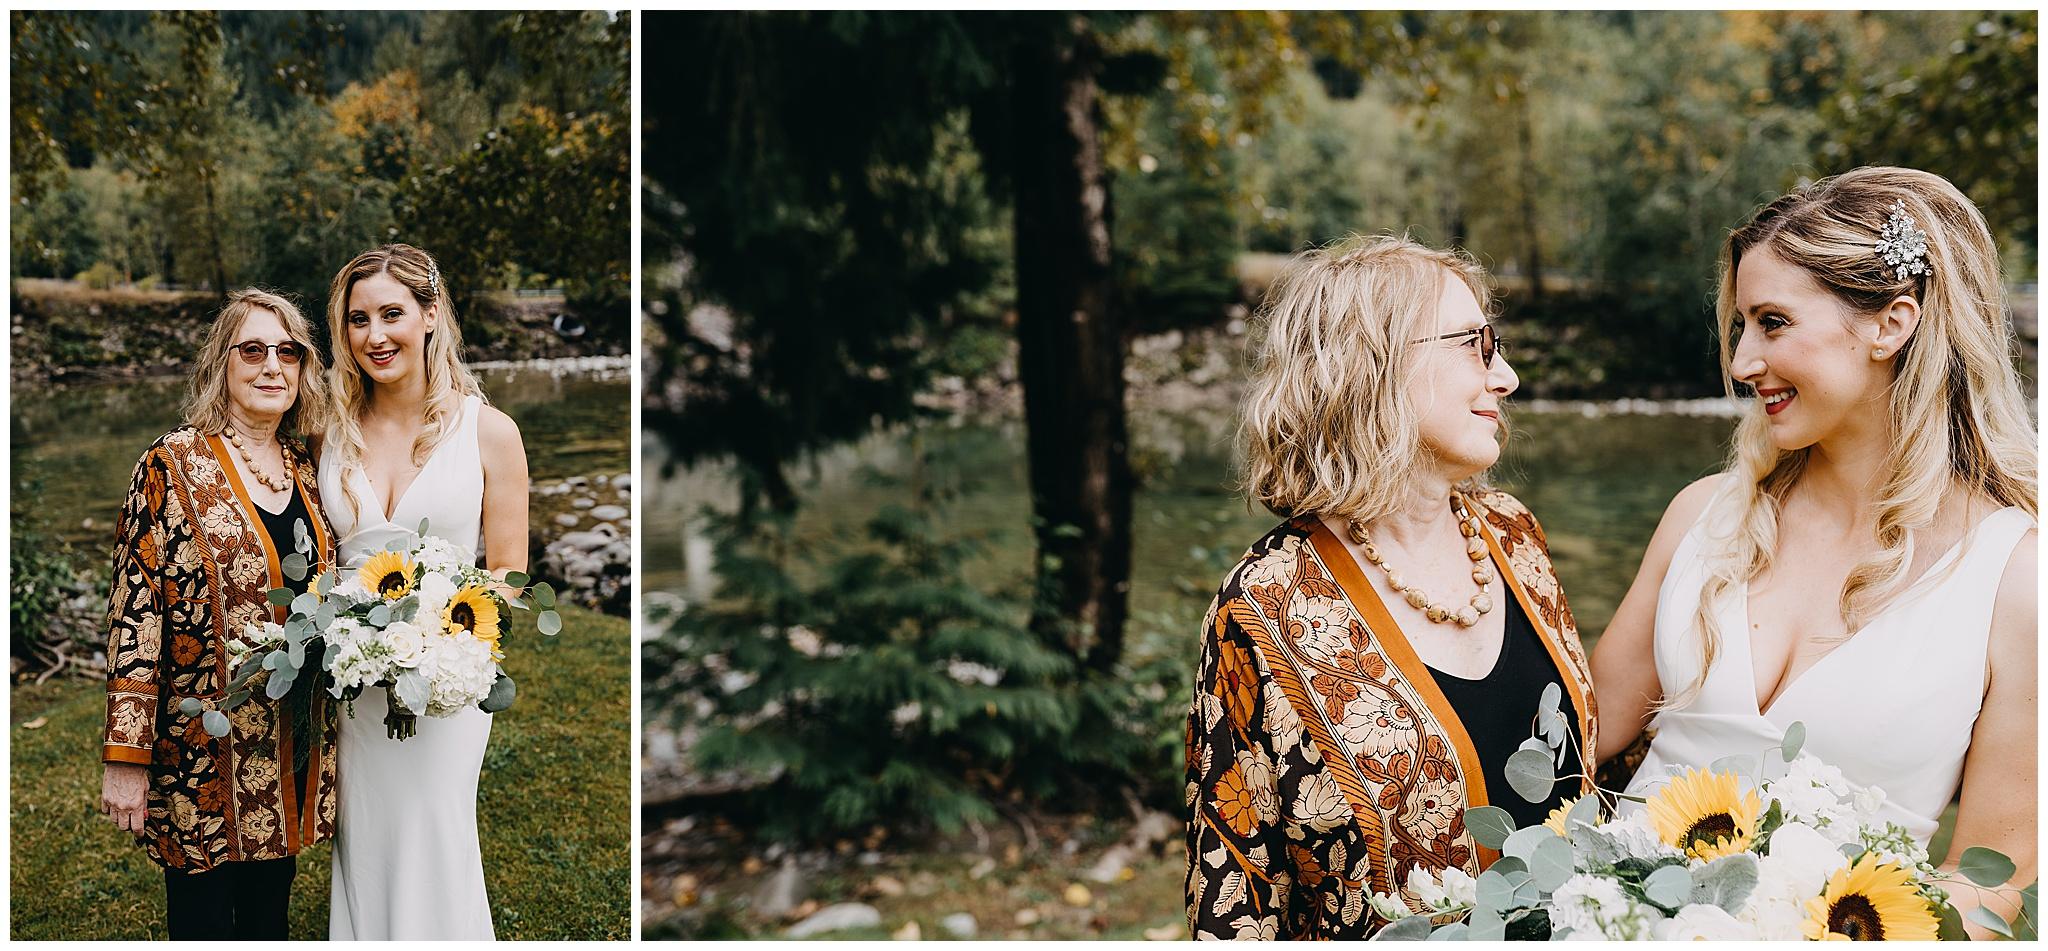 index-wa-wedding34.jpg